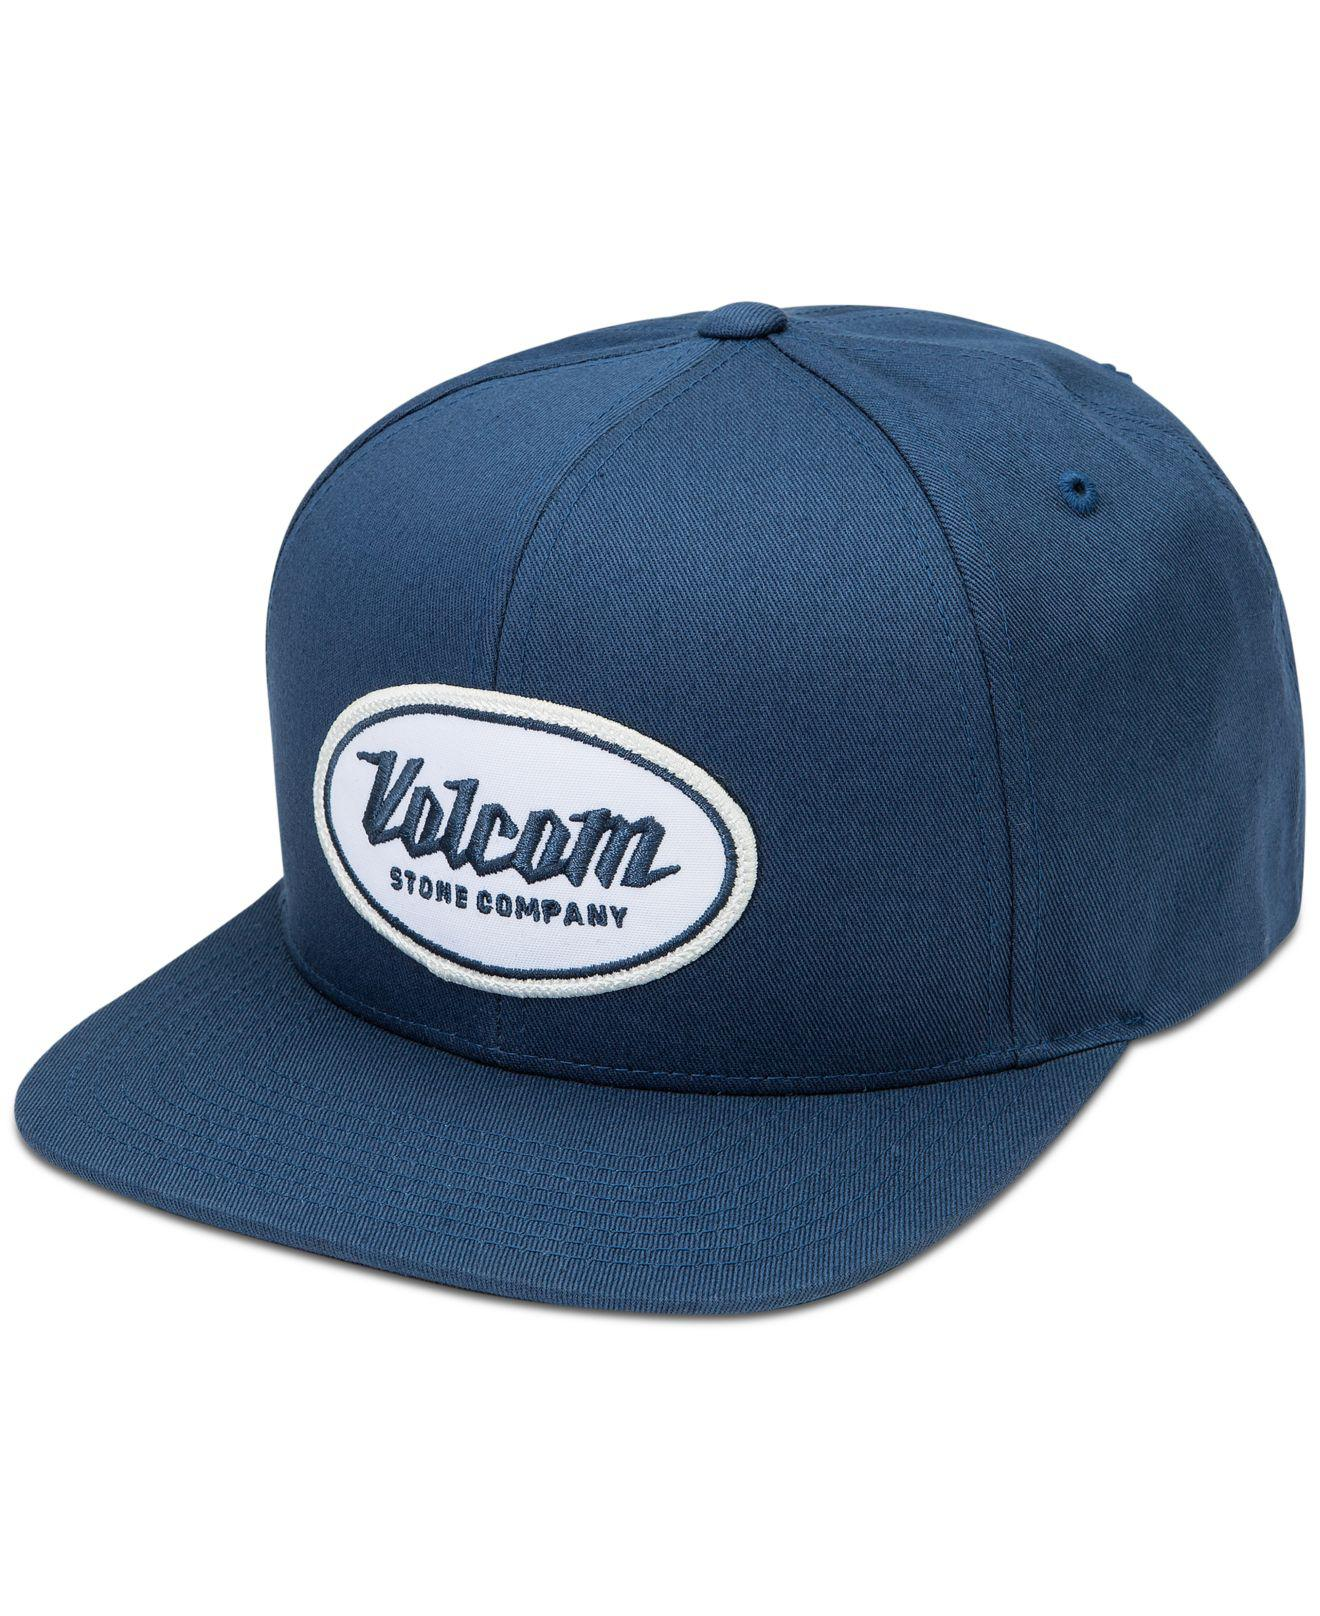 Lyst - Volcom Men s Cresticle Snapback Logo Hat in Blue for Men 869ba6f9d254